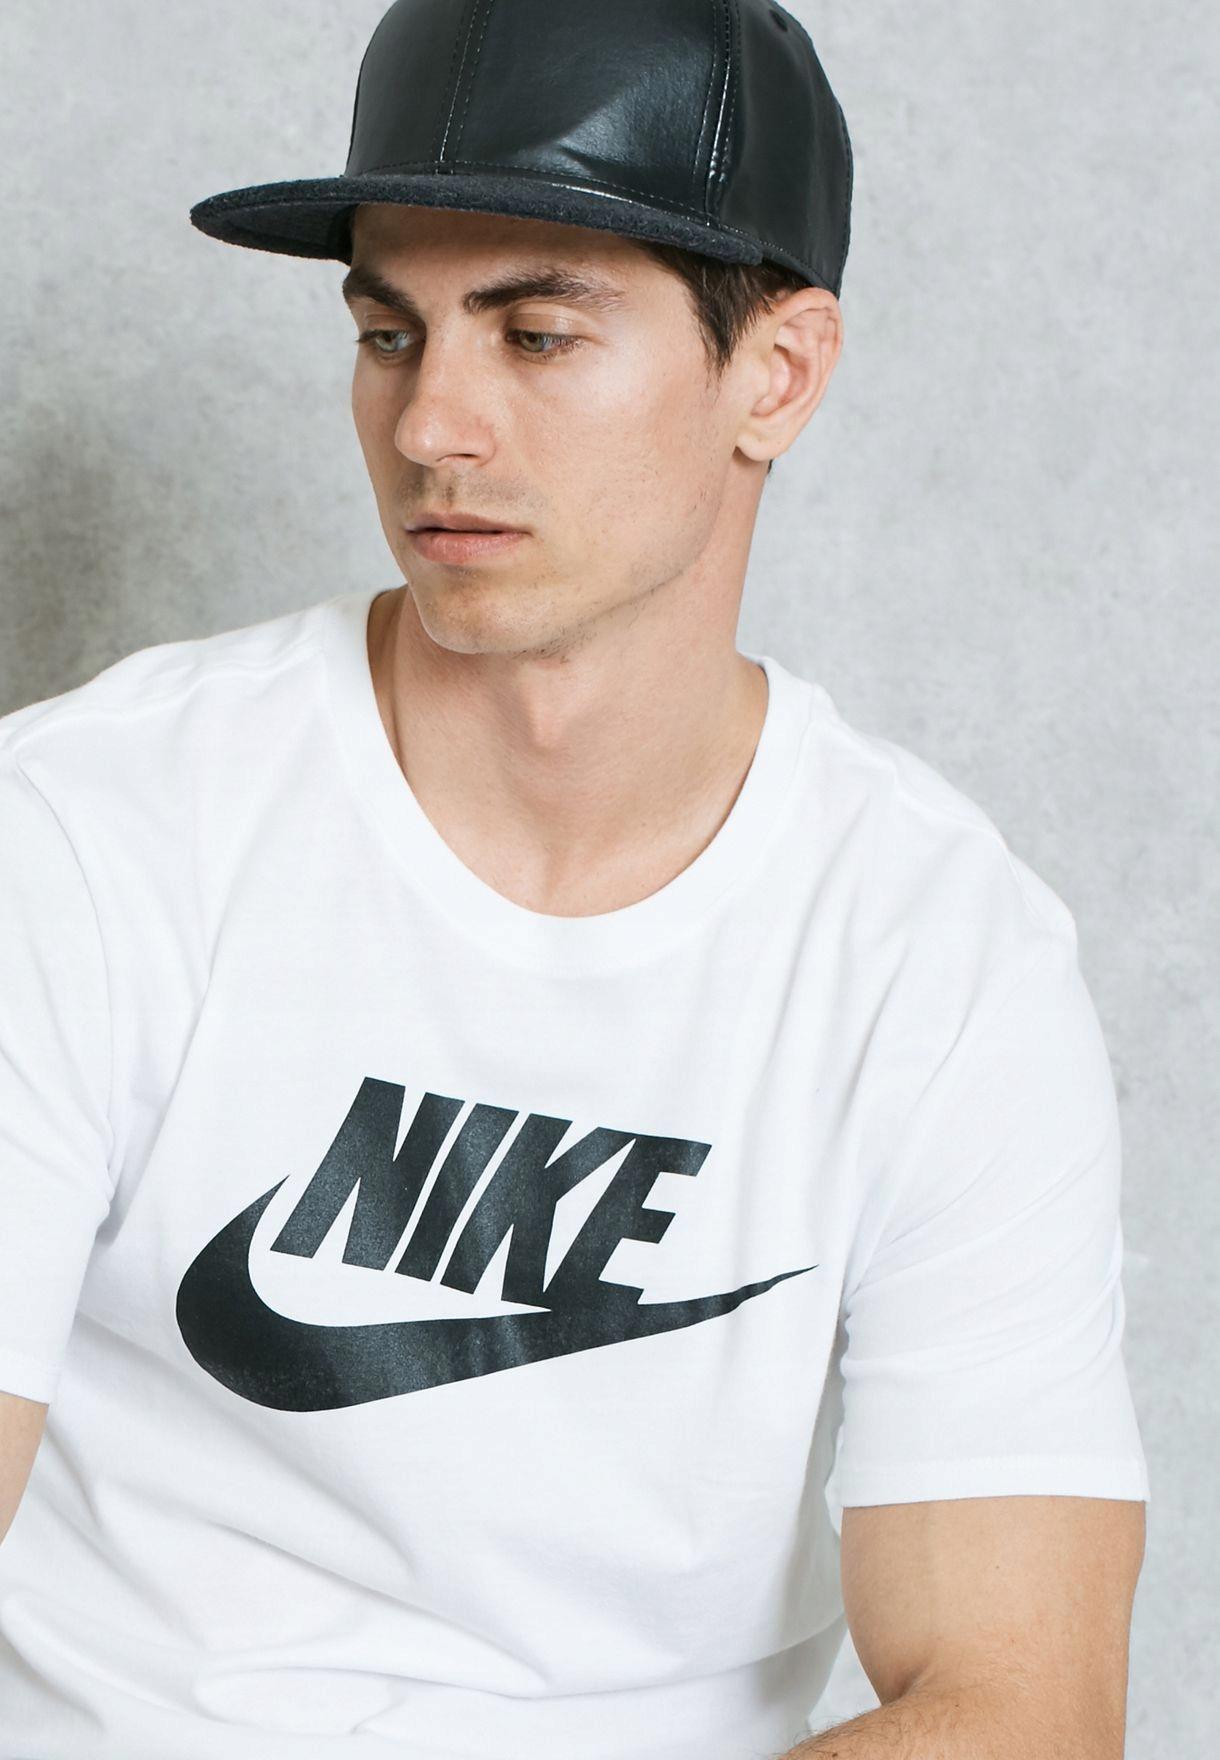 A45 NIKE koszulka męska TSHIRT ICON TEE rozmiar XL